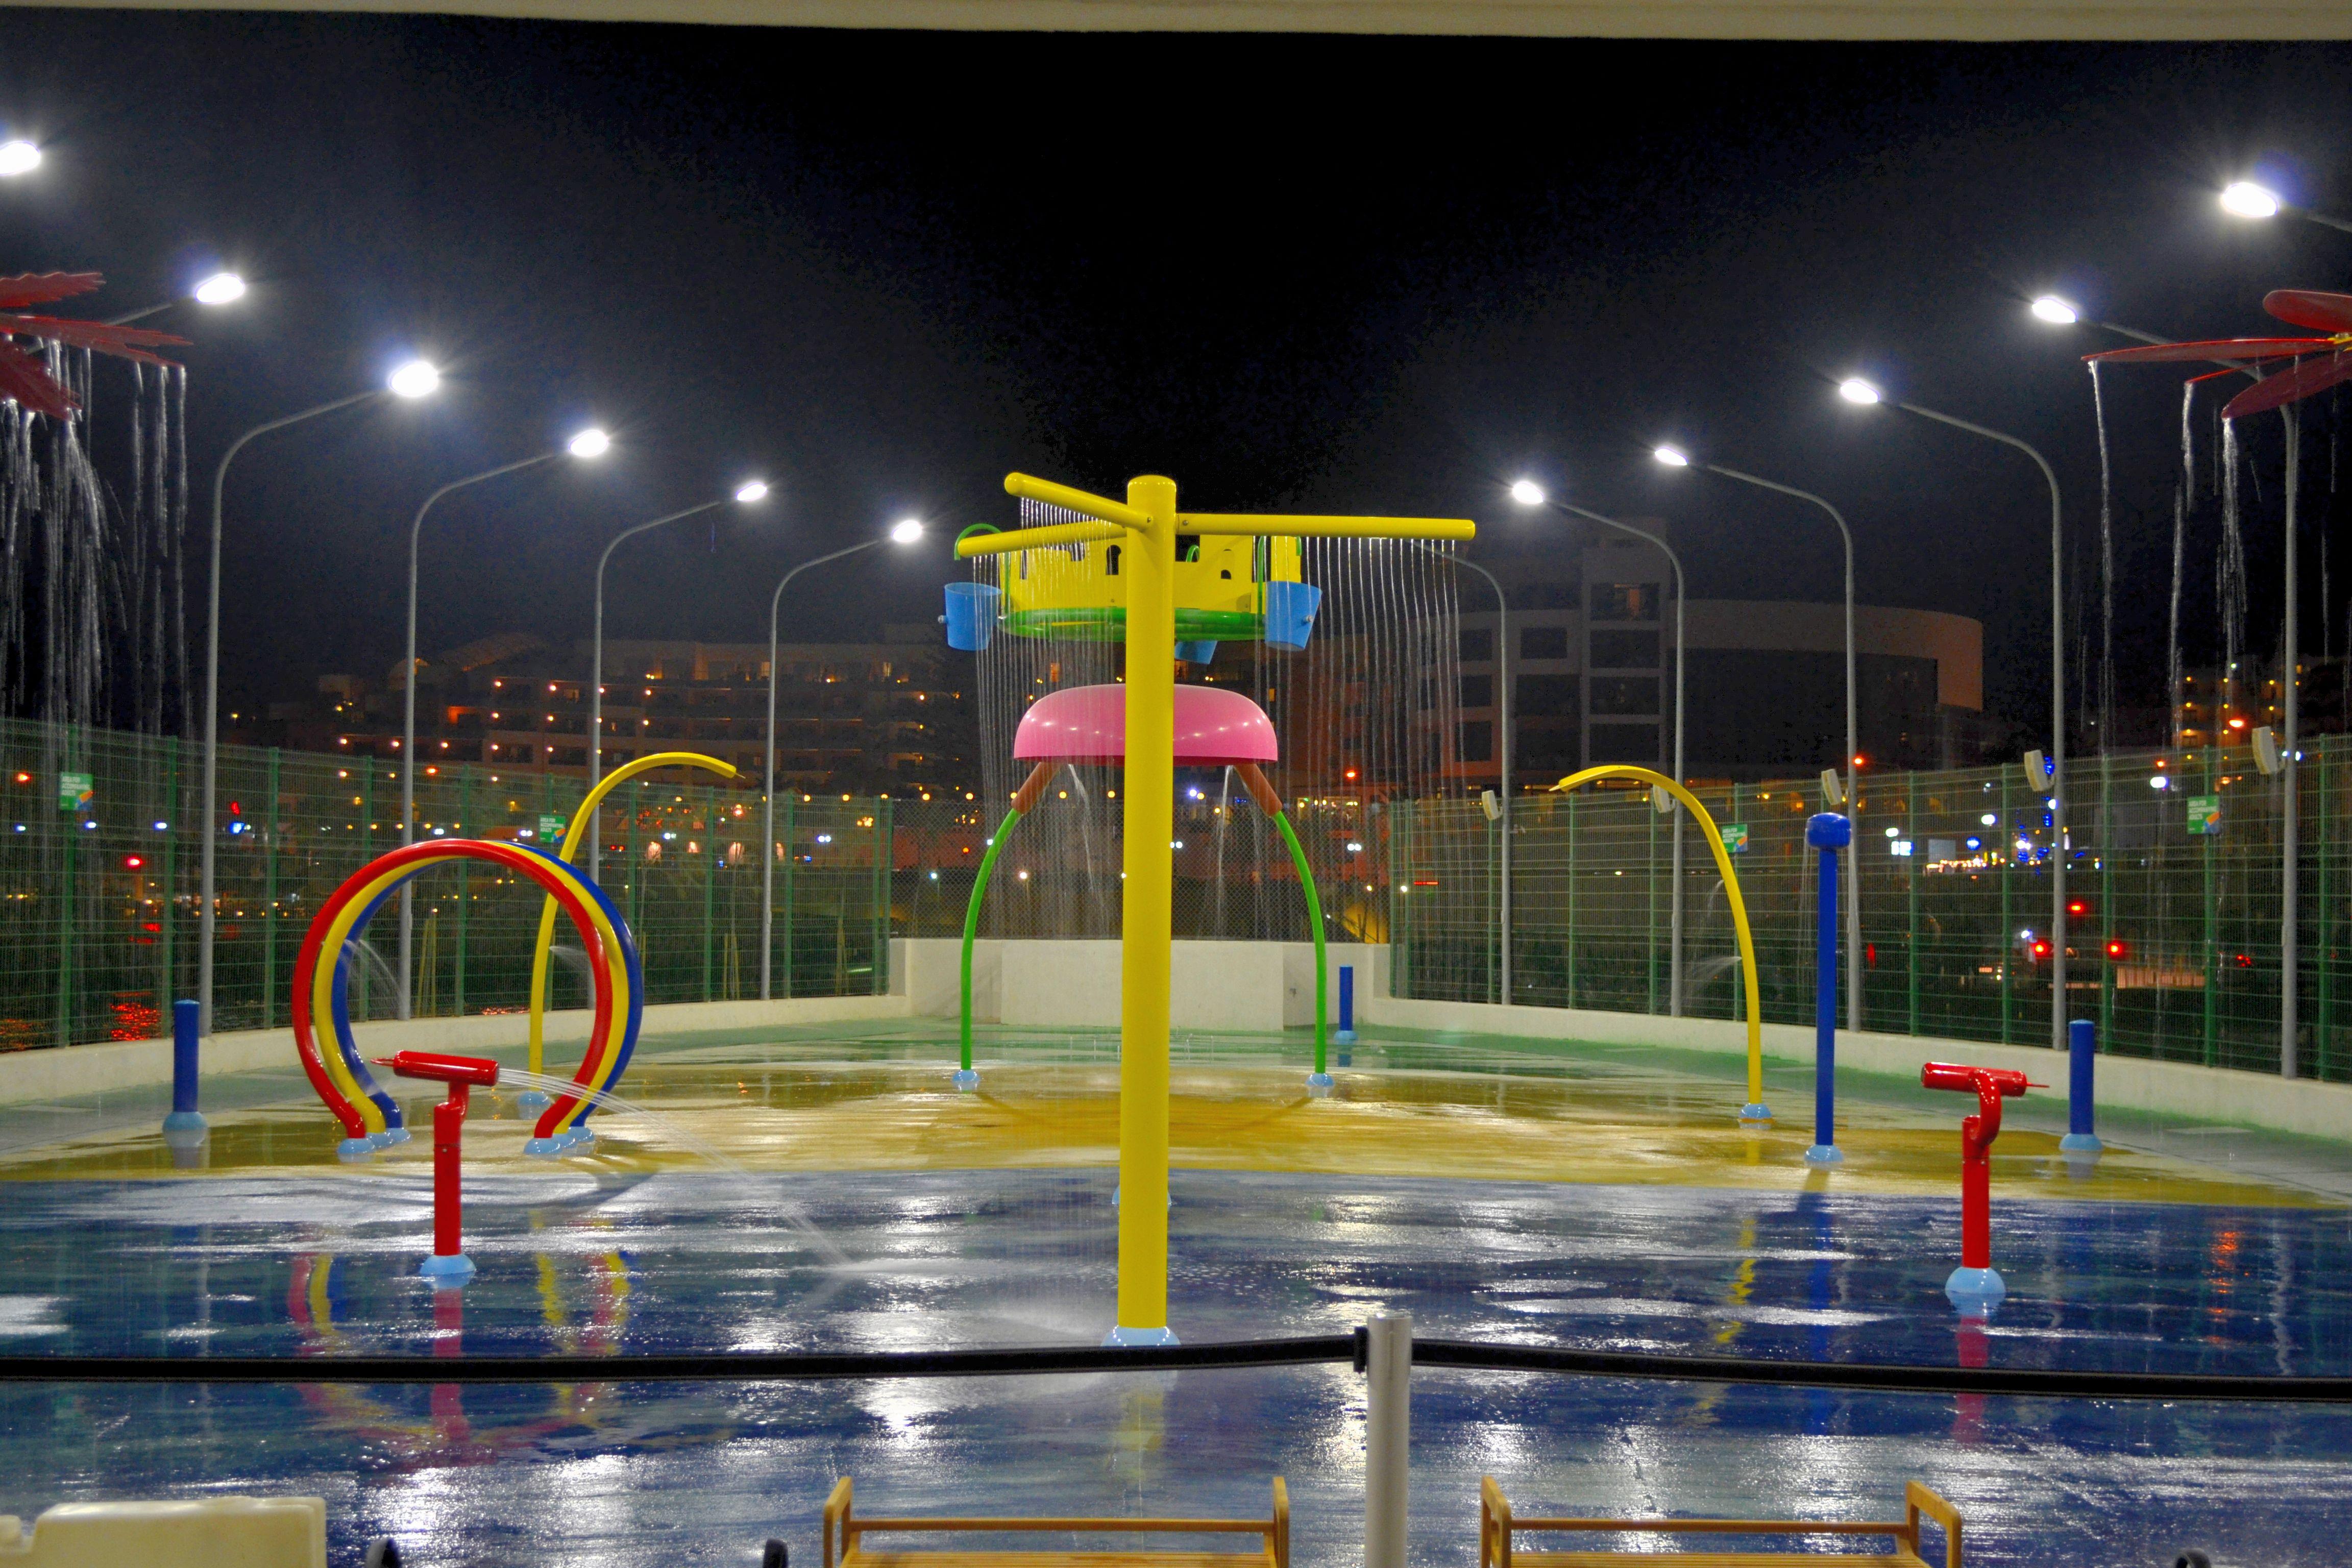 splash pad manufacturer, splash park equipment, water playground equipment